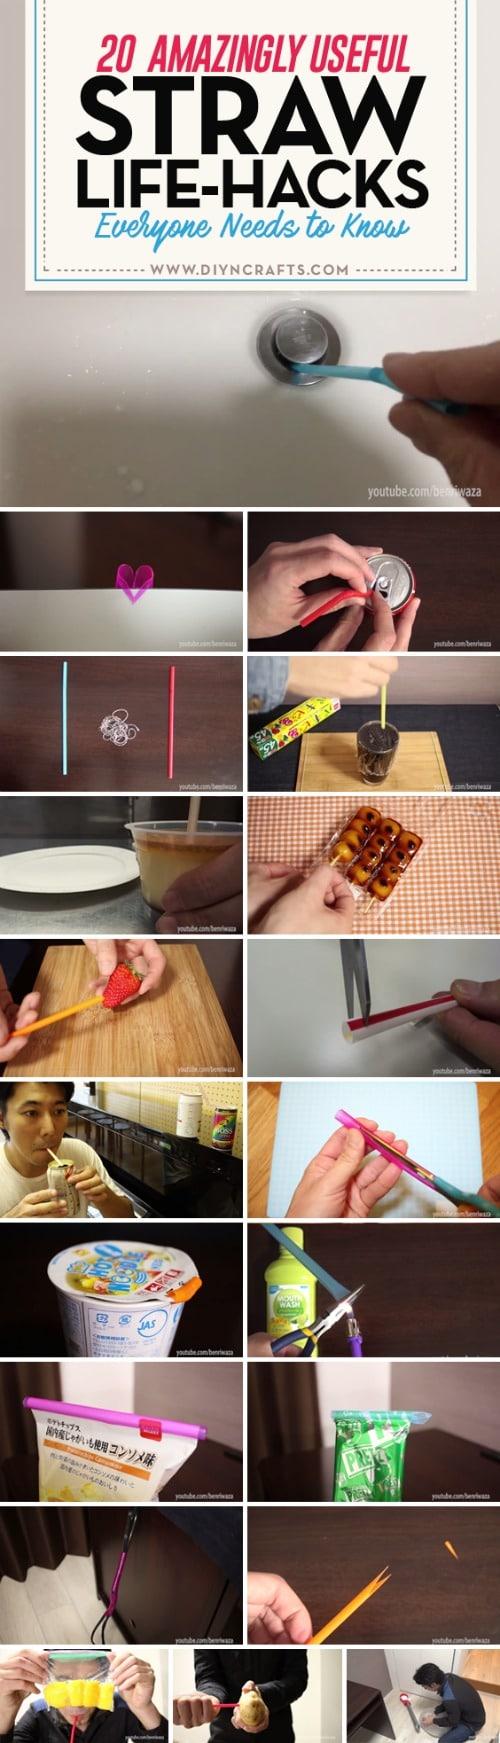 20 Amazingly Useful Straw Life-Hacks Everyone Needs to Know {Brilliant Lifehack Collection}